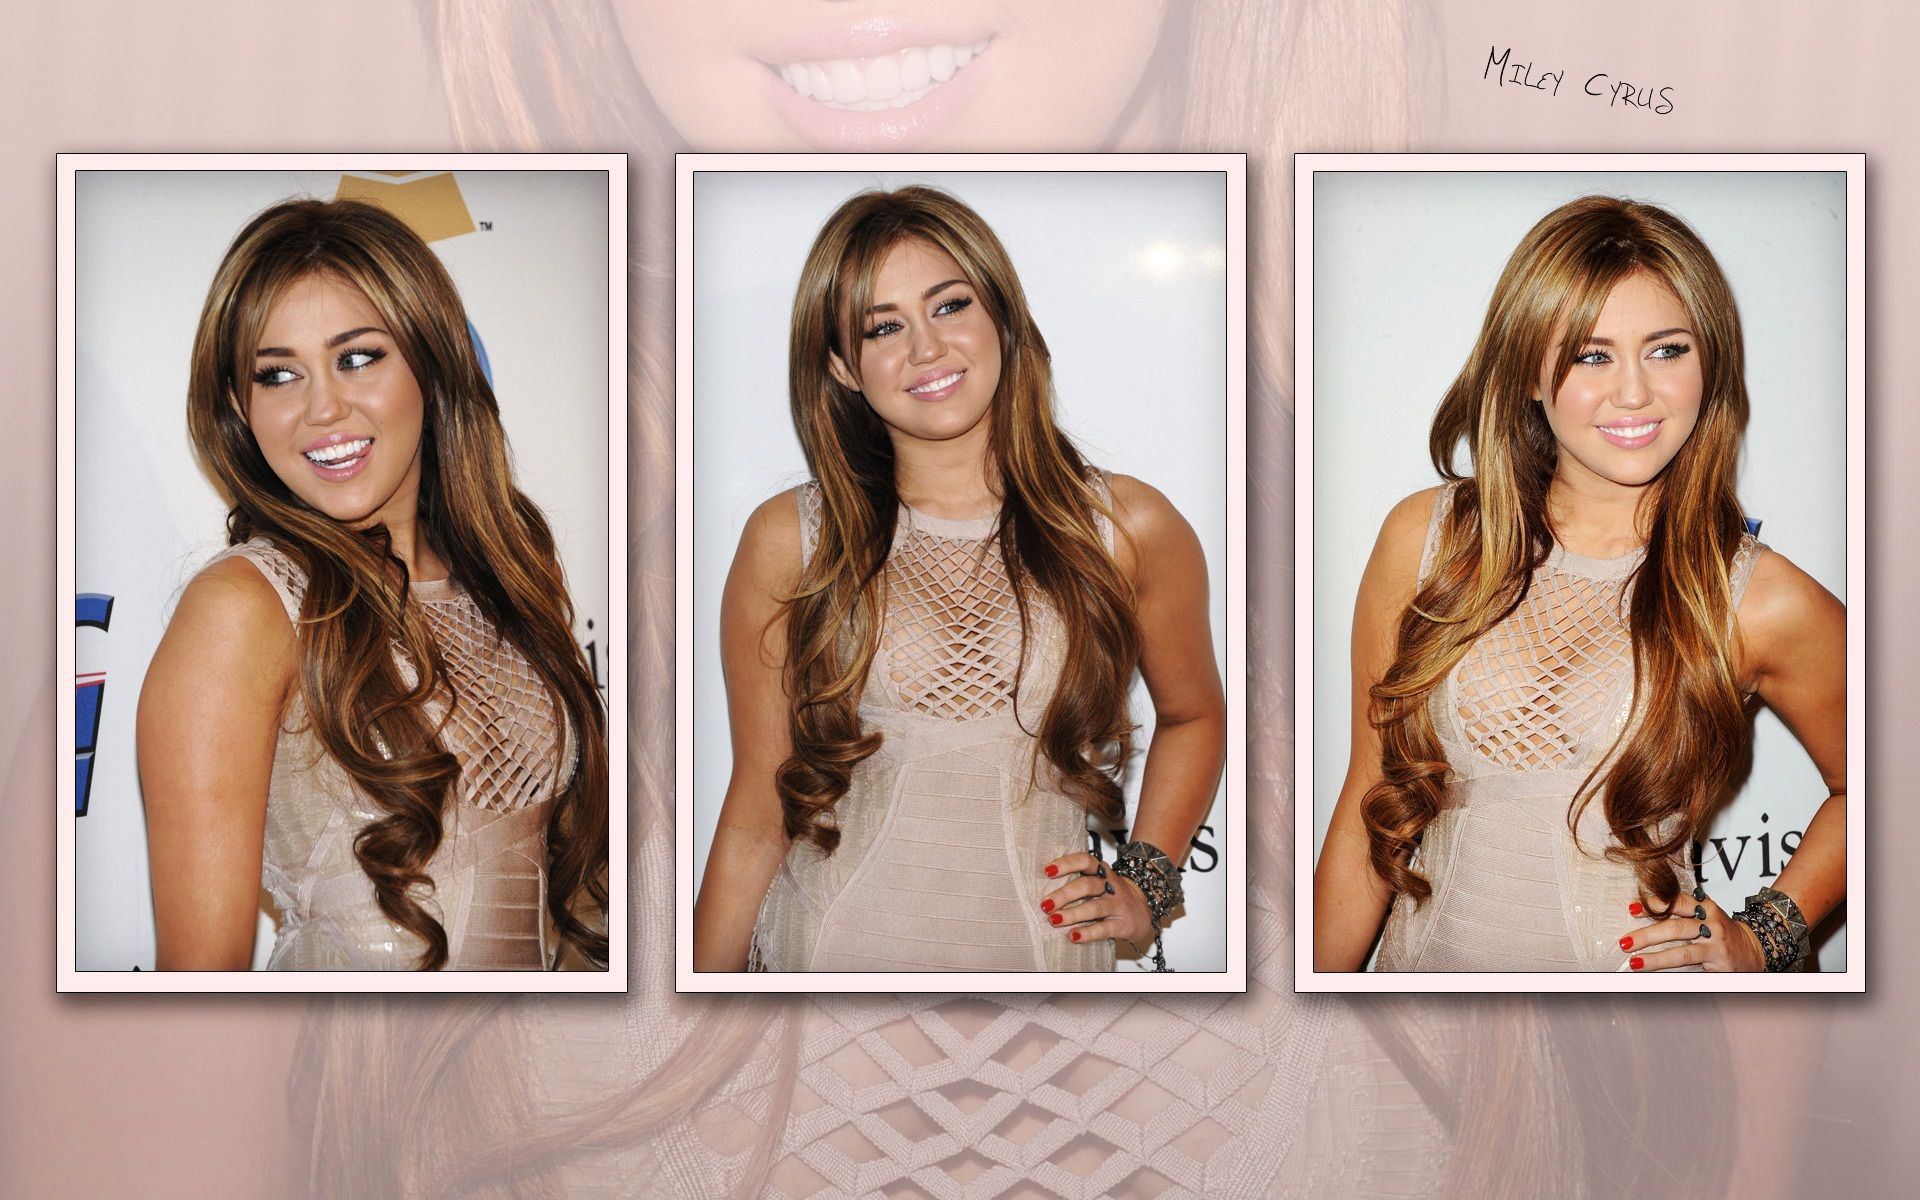 Miley Cyrus 60 wallpaper